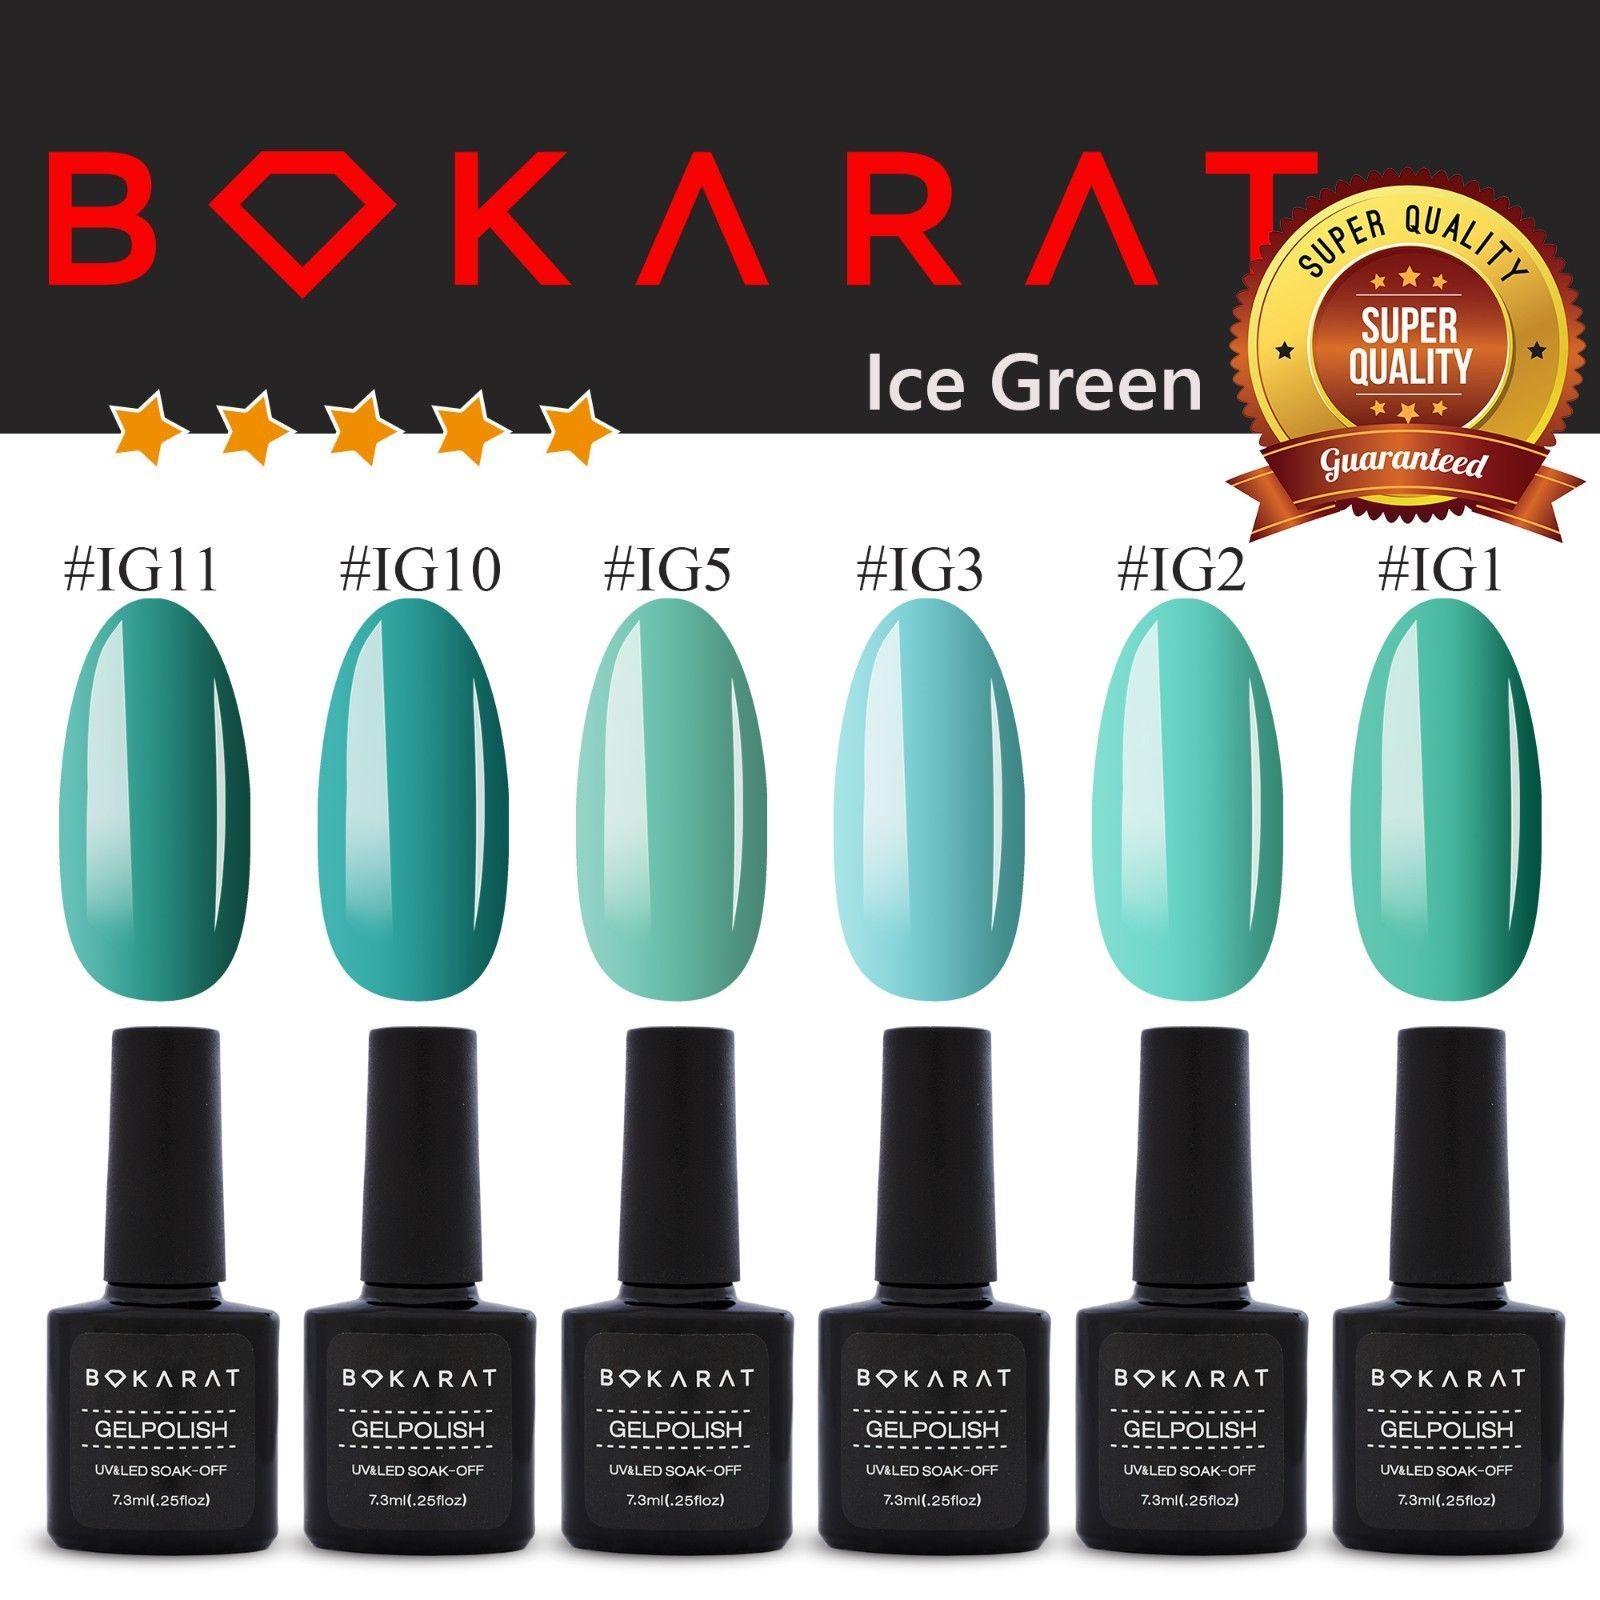 Ice Green Color Bokarat Gel Nail Polish 7.3 ml Soak Off UV LED High Quality